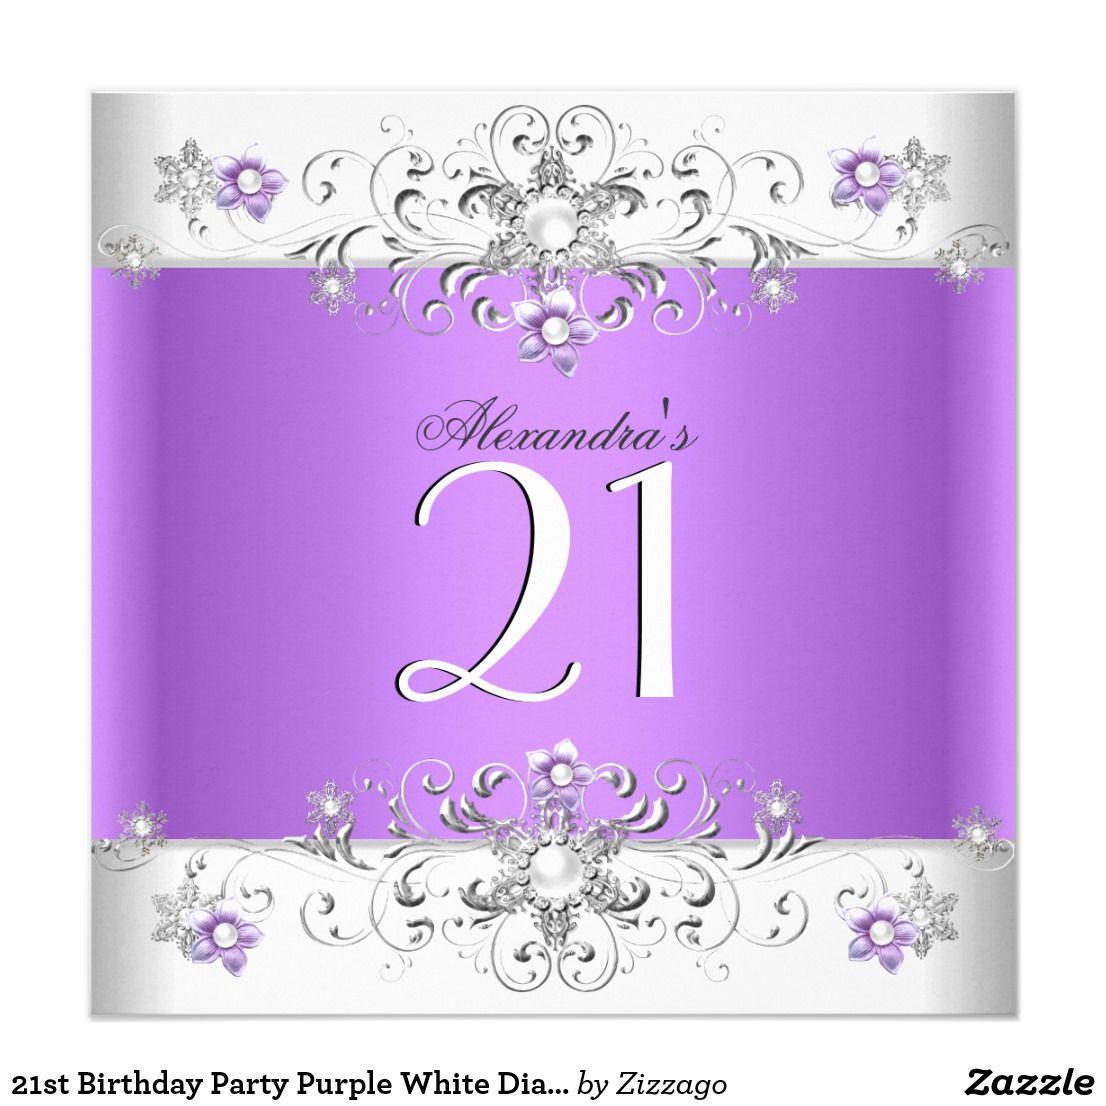 21st birthday party purple white